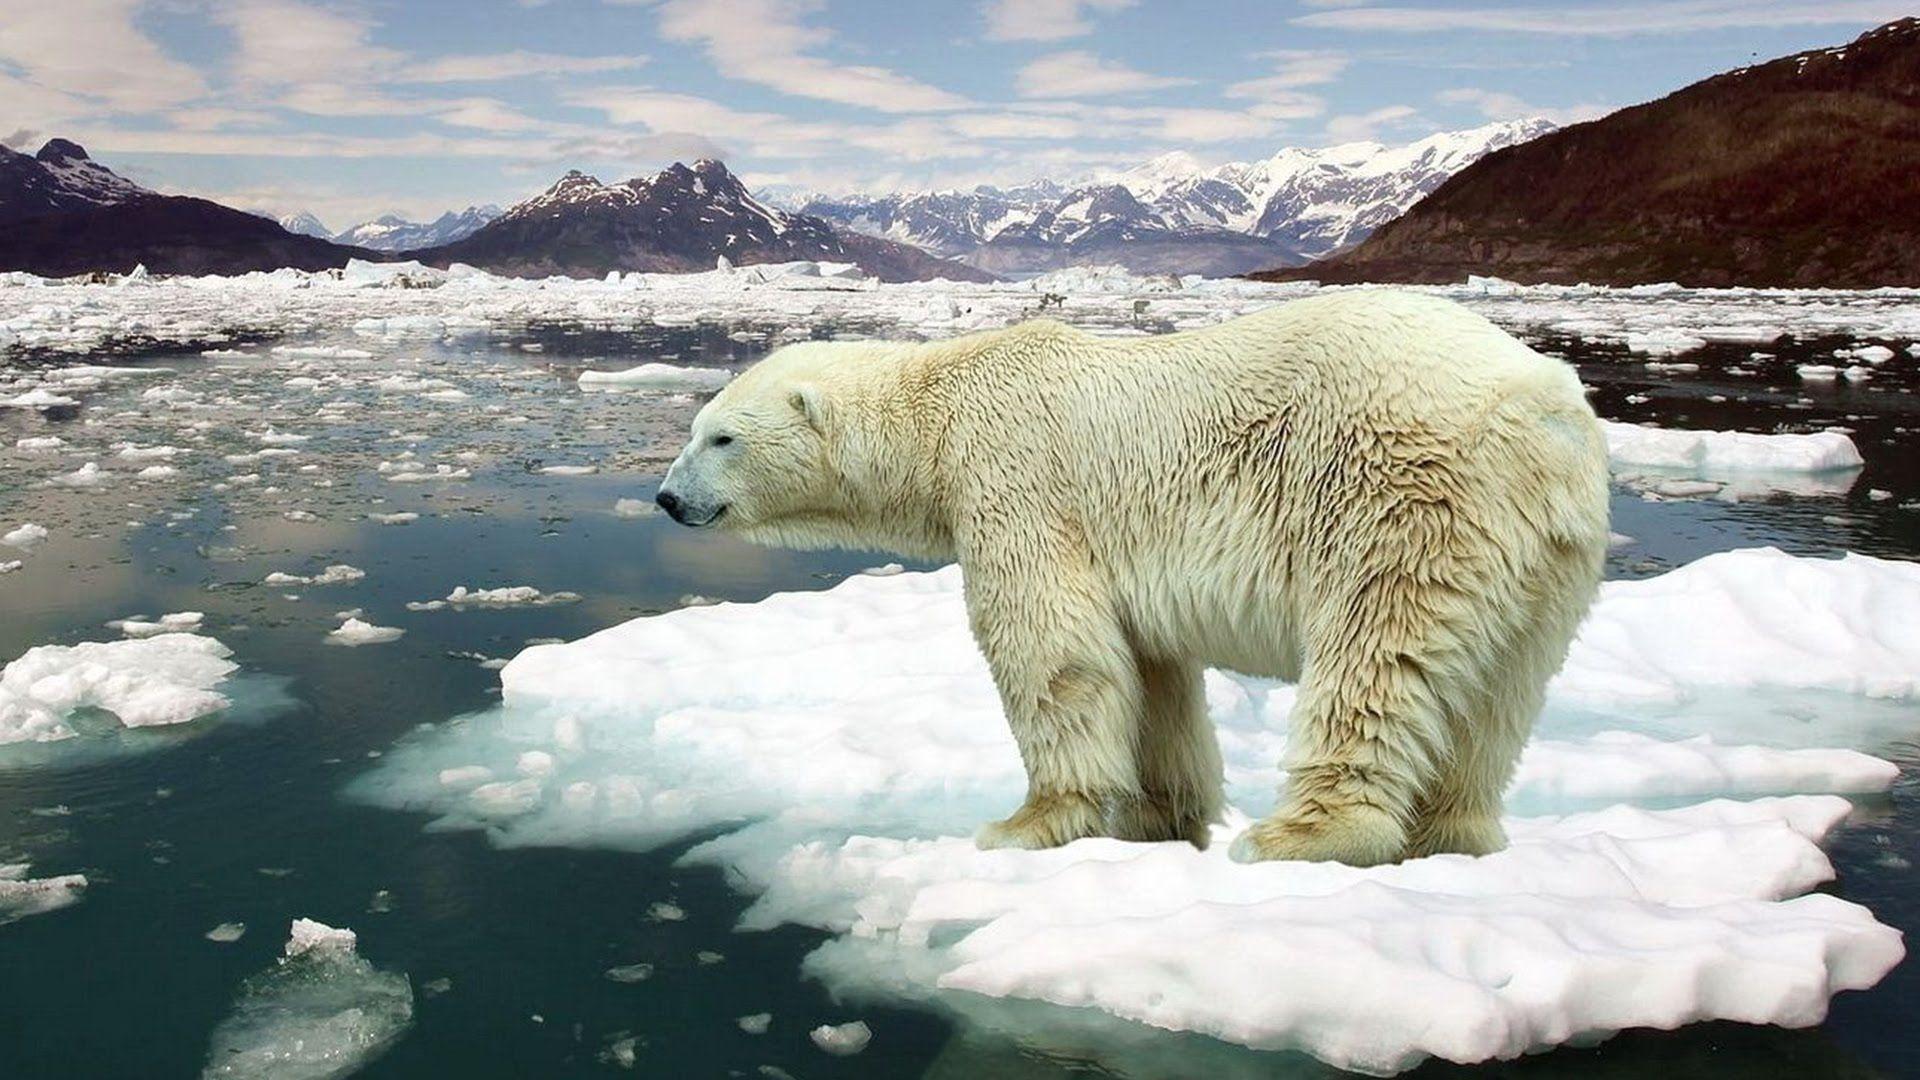 What If Global Warming Is A Myth? Polar bear wallpaper